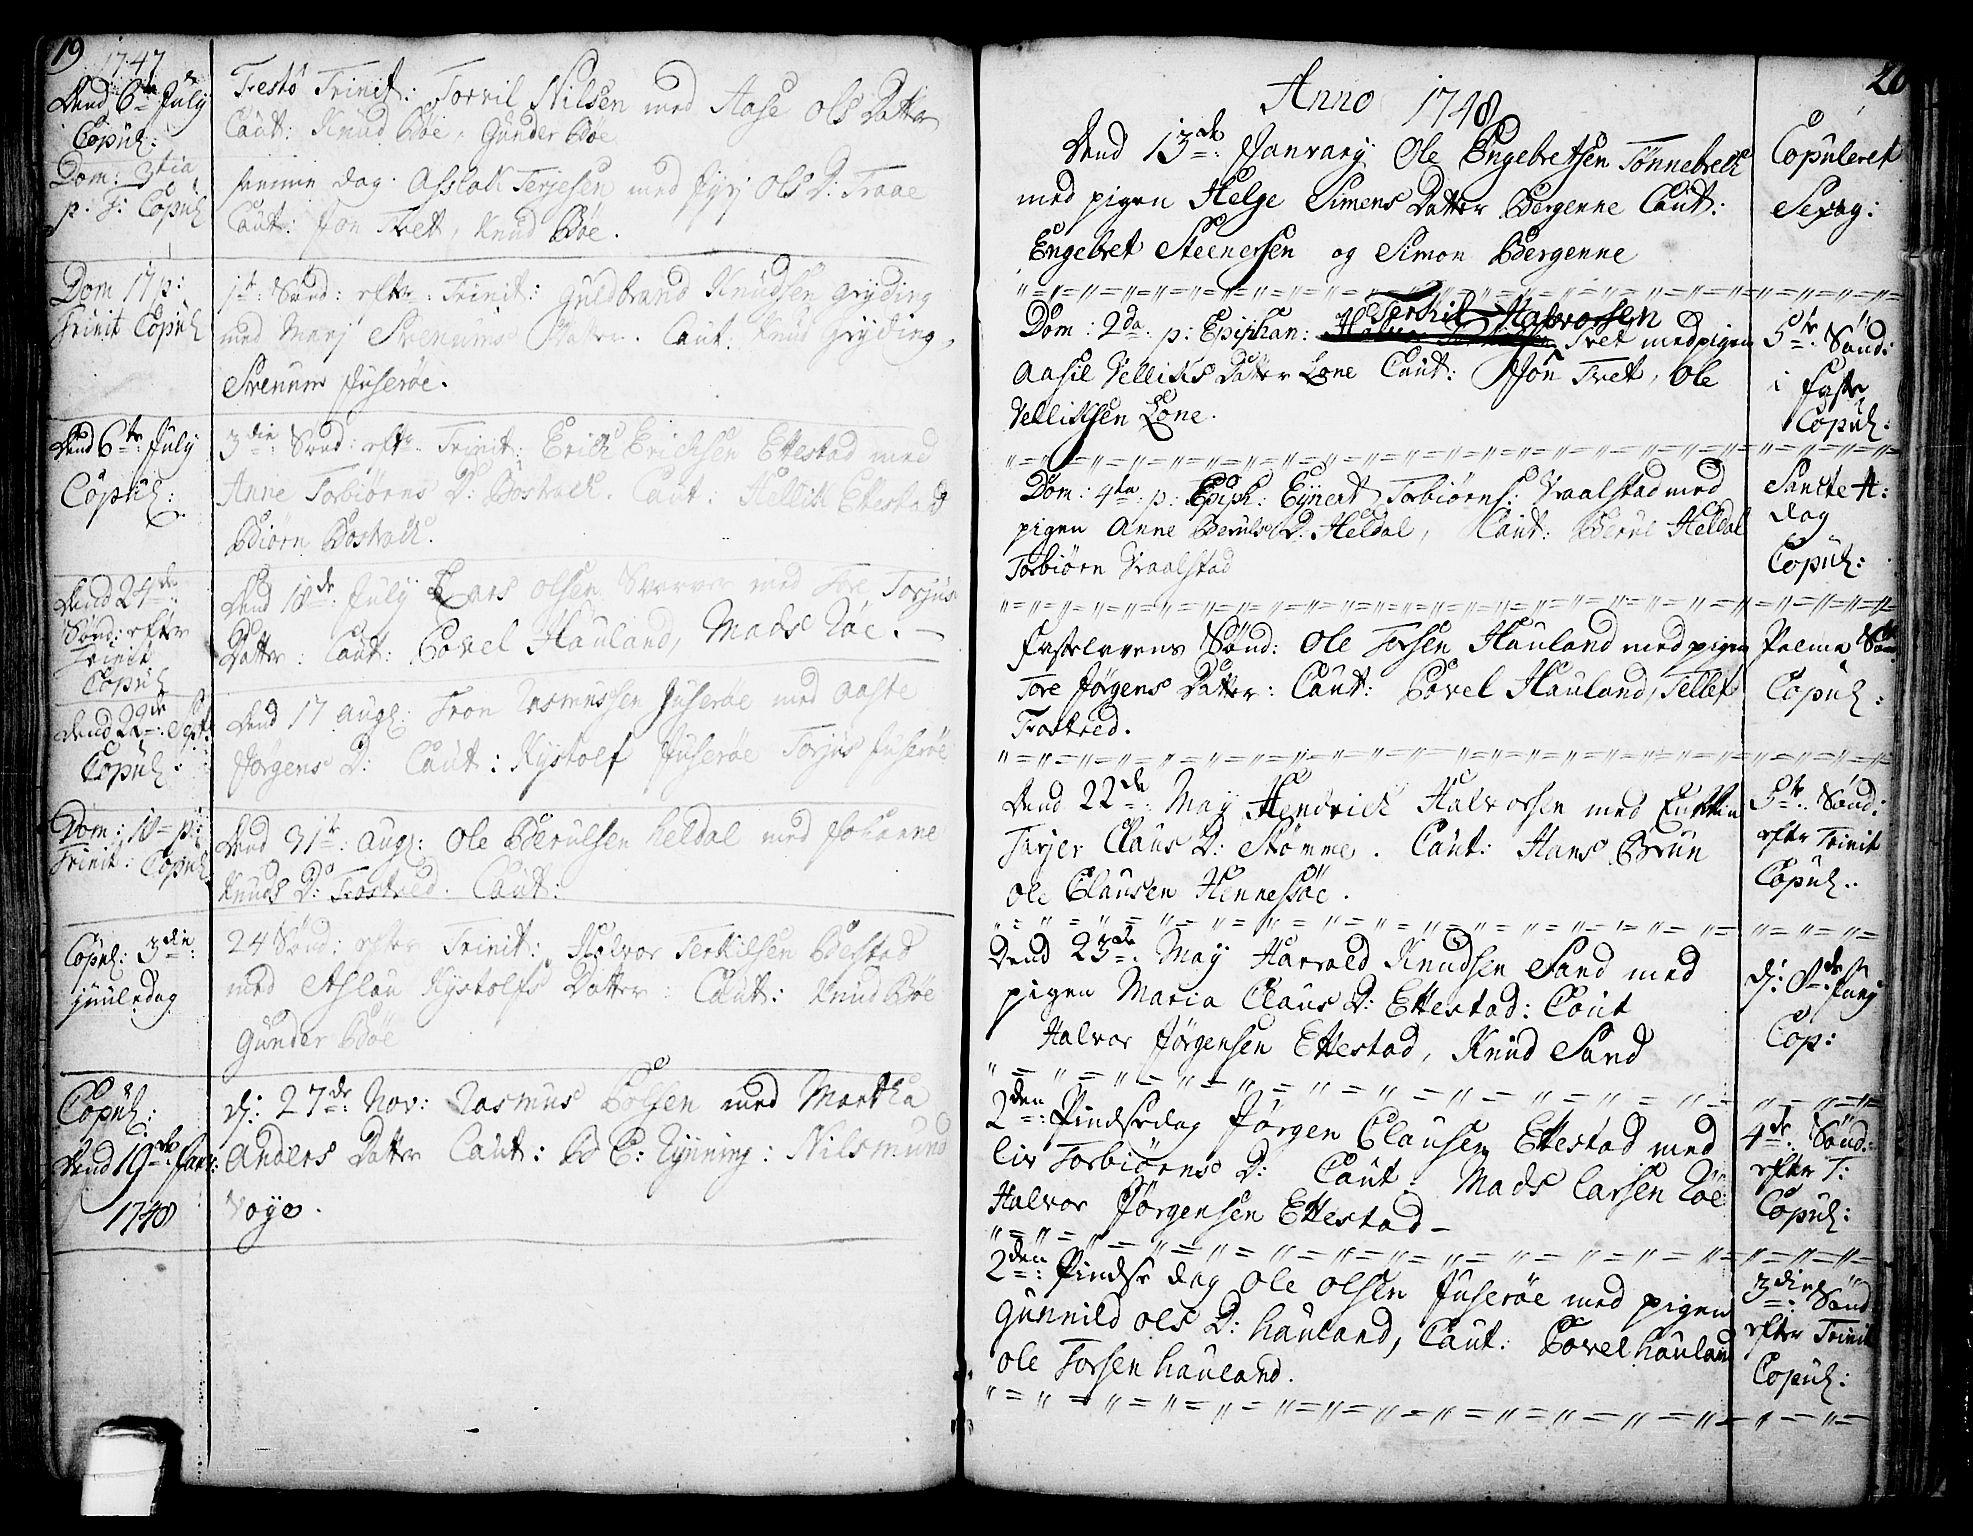 SAKO, Drangedal kirkebøker, F/Fa/L0002: Ministerialbok nr. 2, 1733-1753, s. 19-20